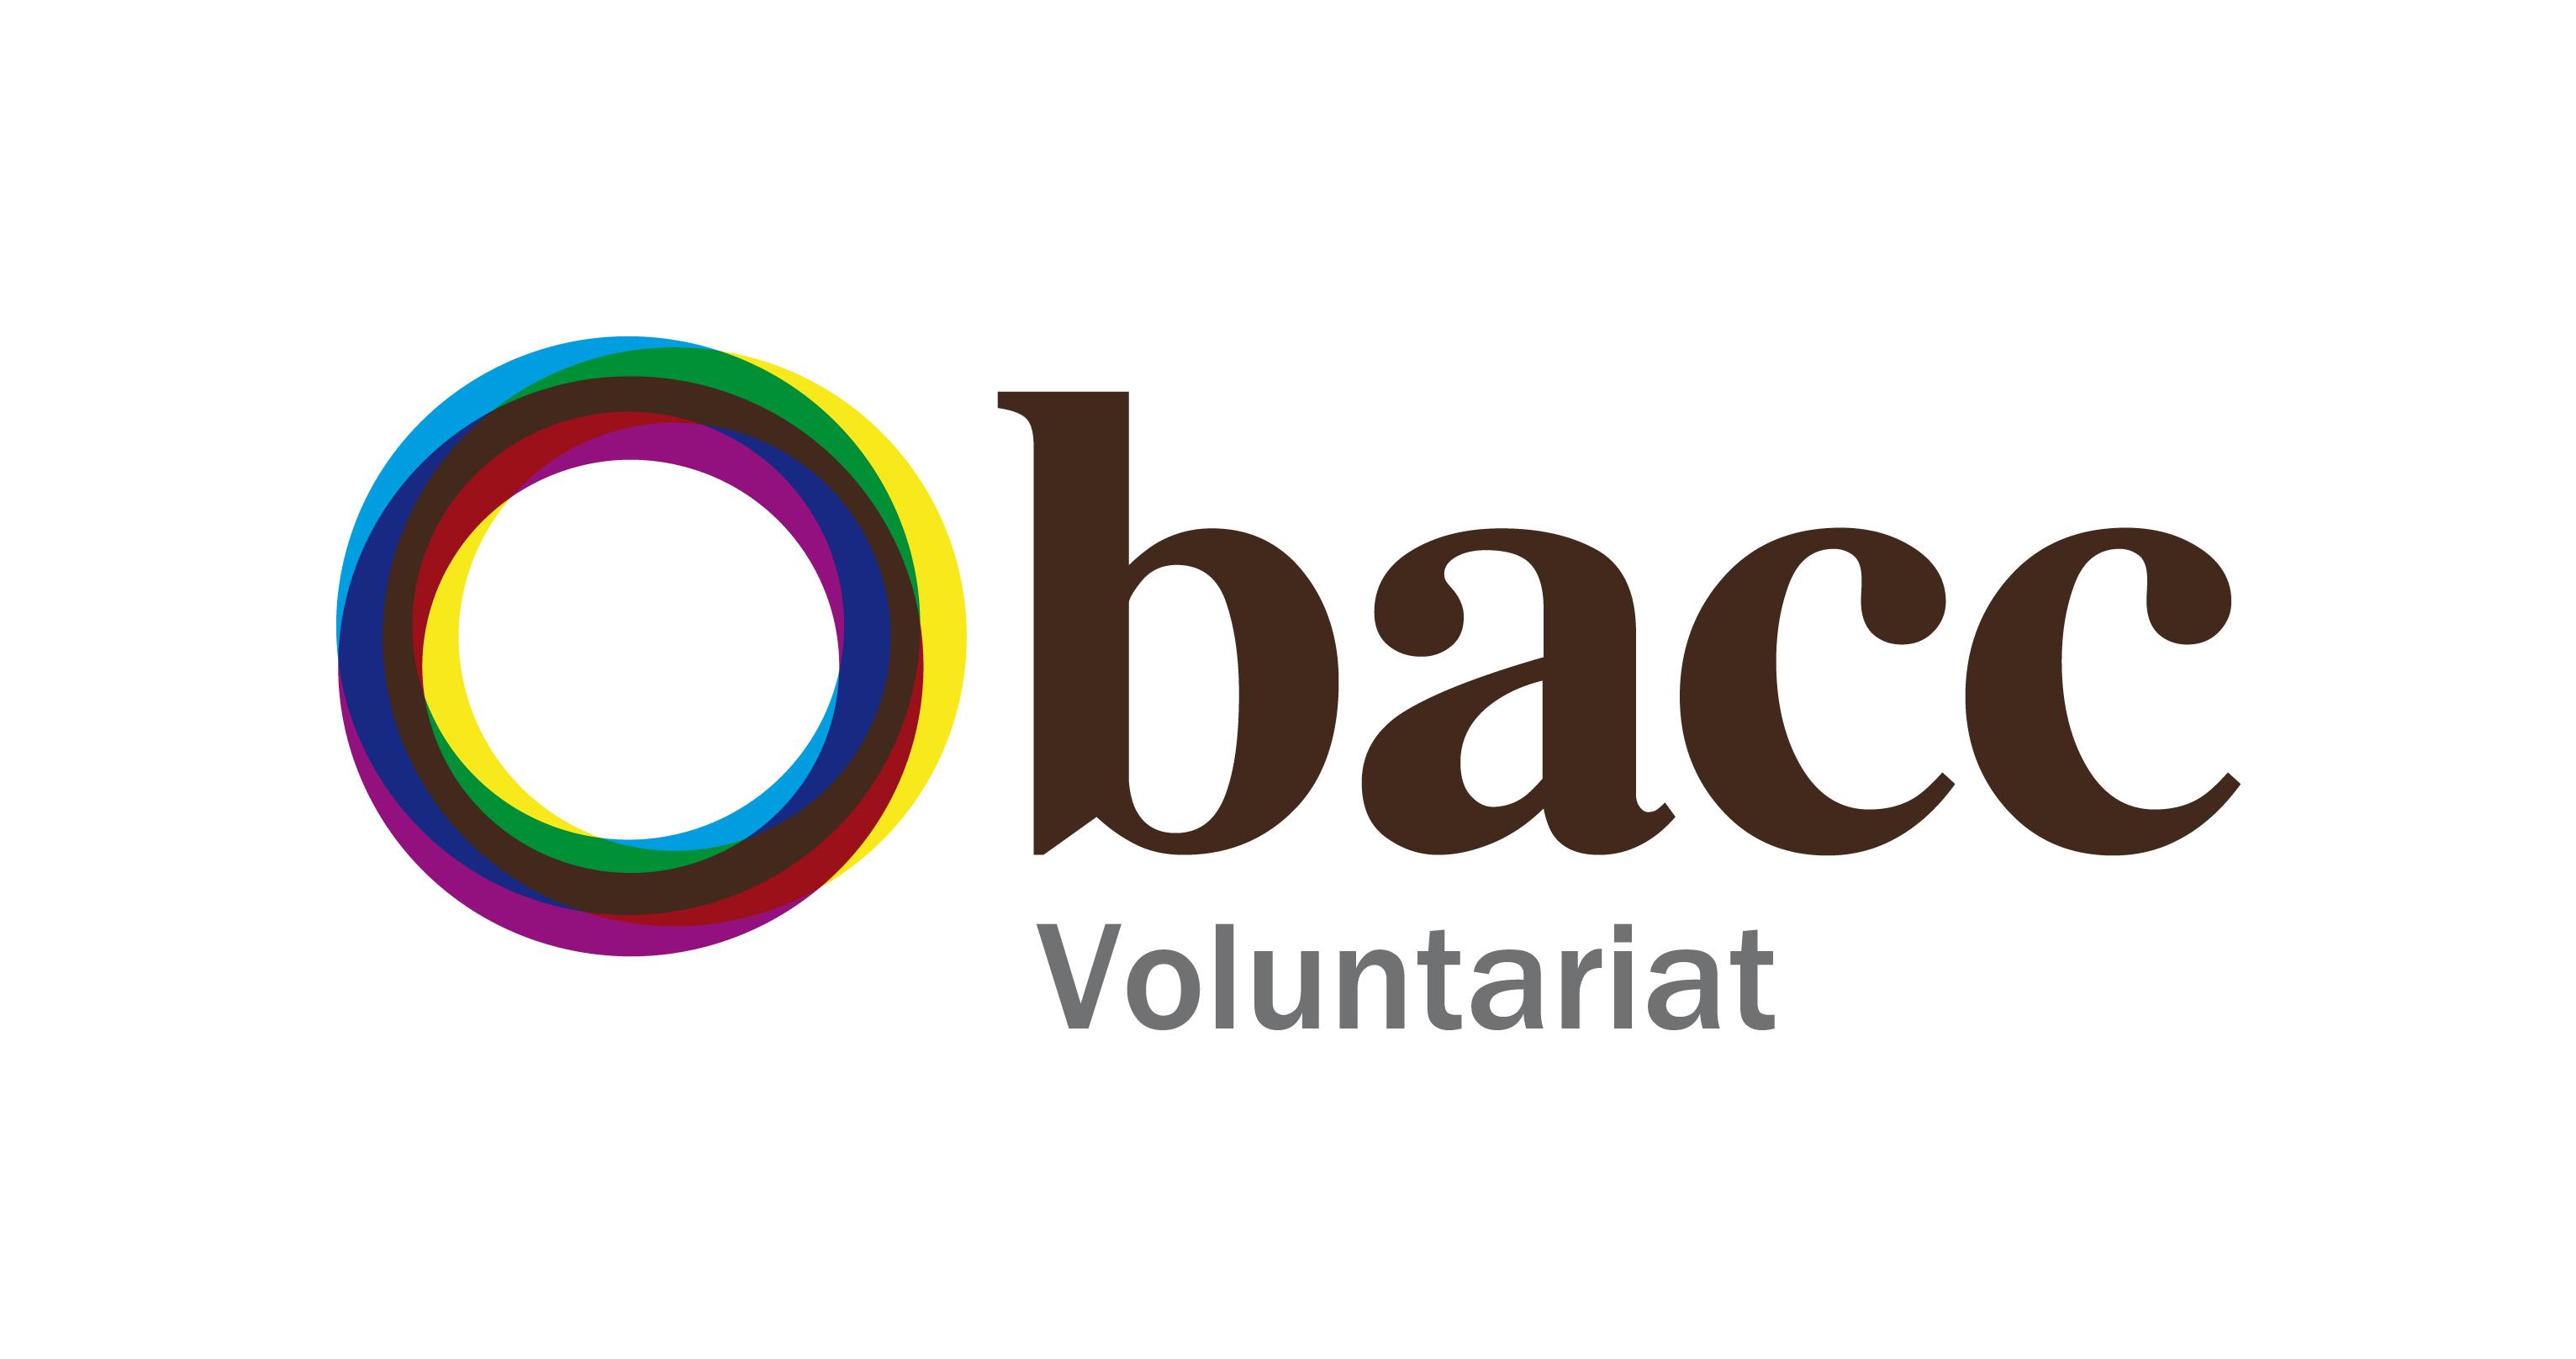 bacc_voluntariat